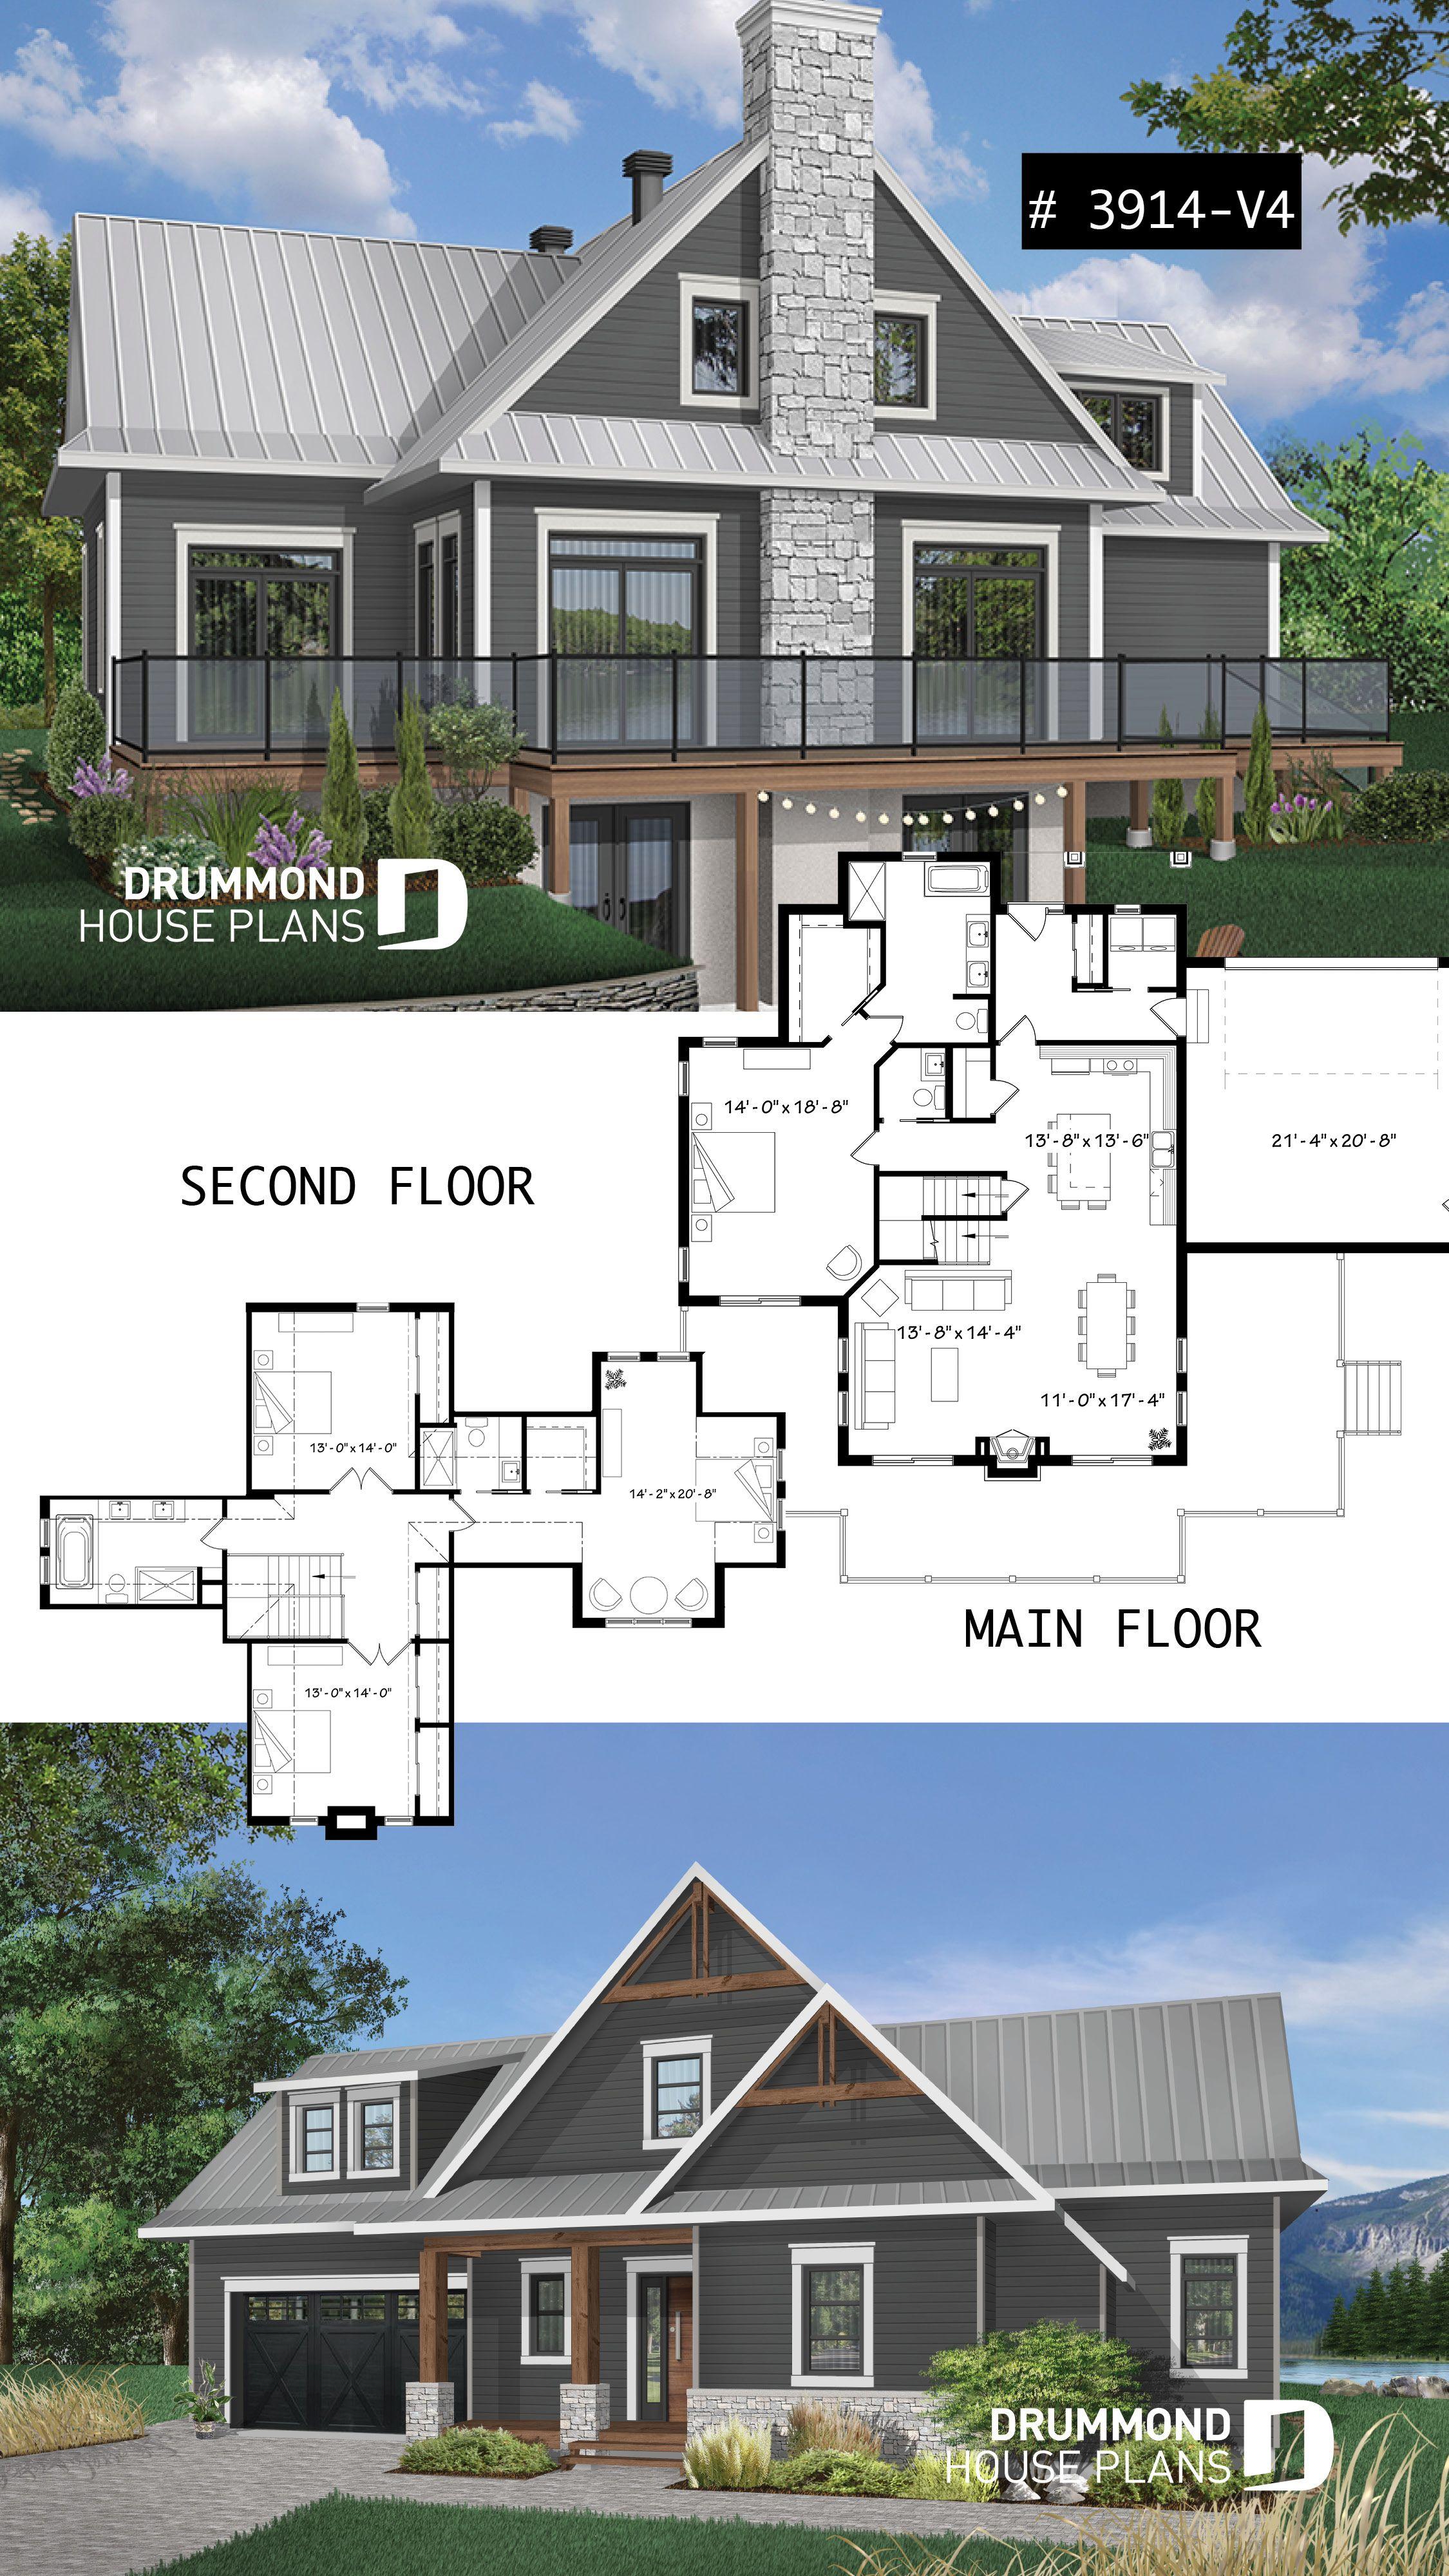 House Plan Bonavista No 3914 V4 Drummond House Plans Sims